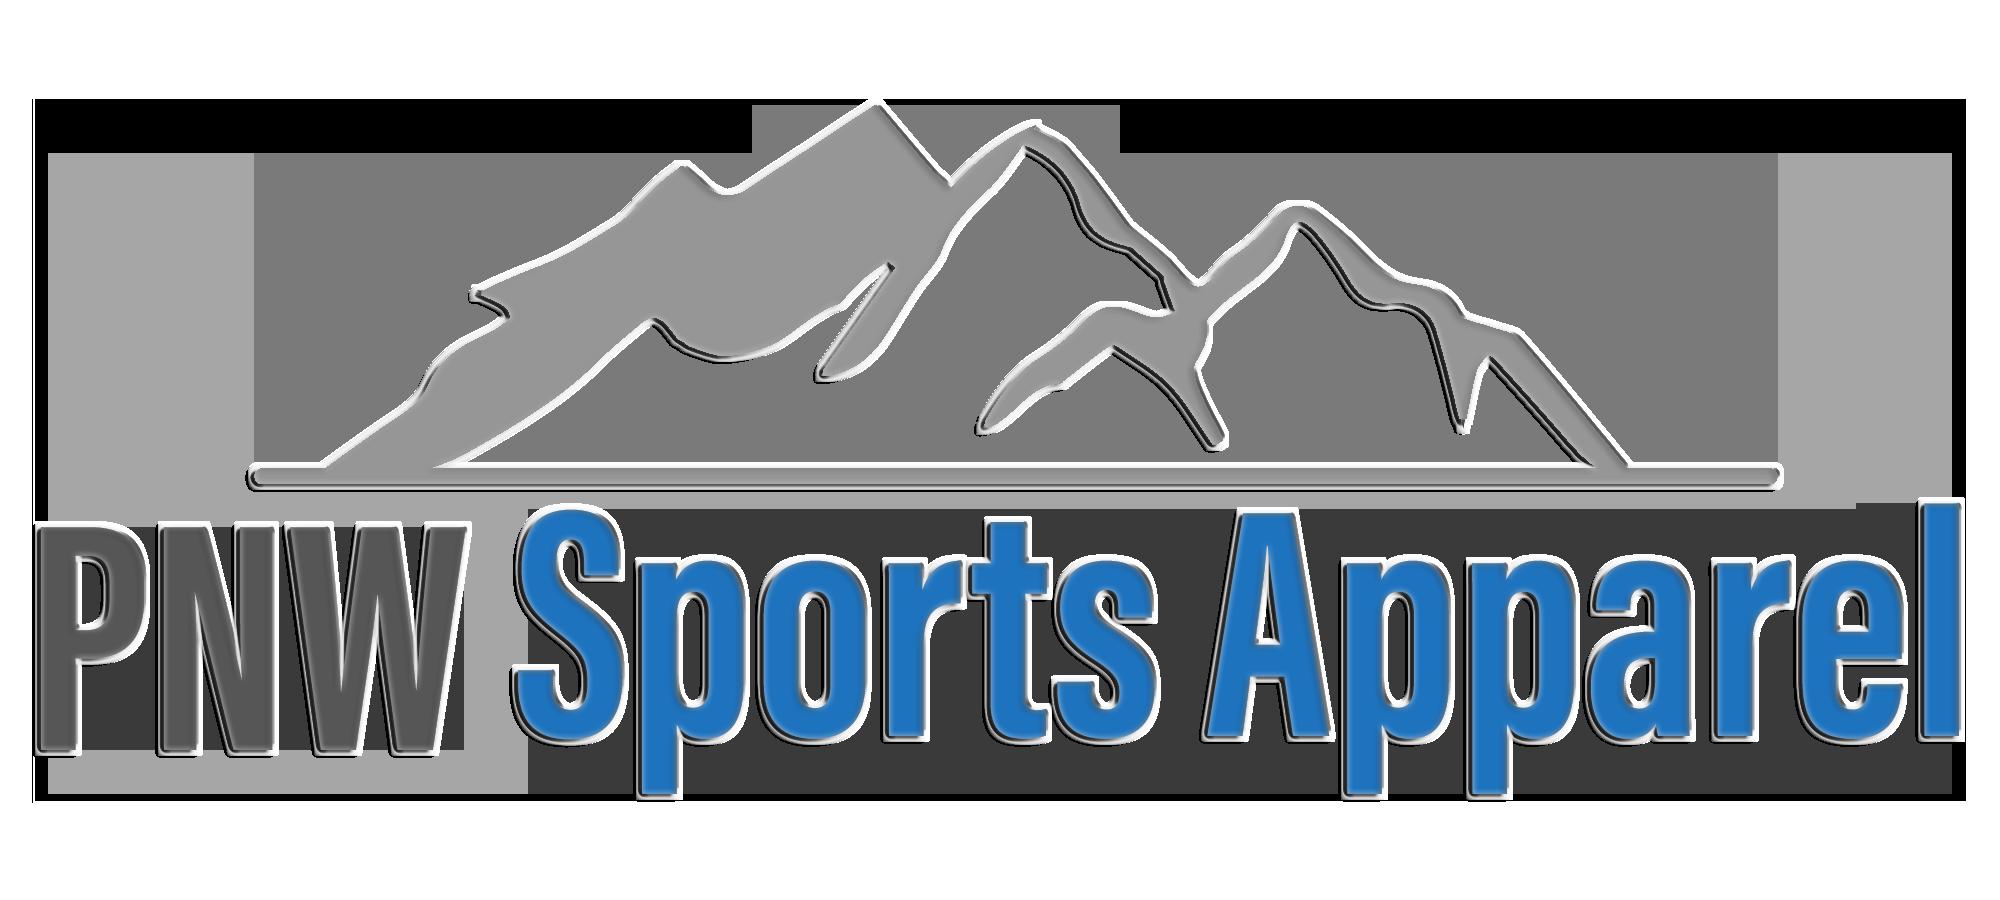 PNW Sports Apparel